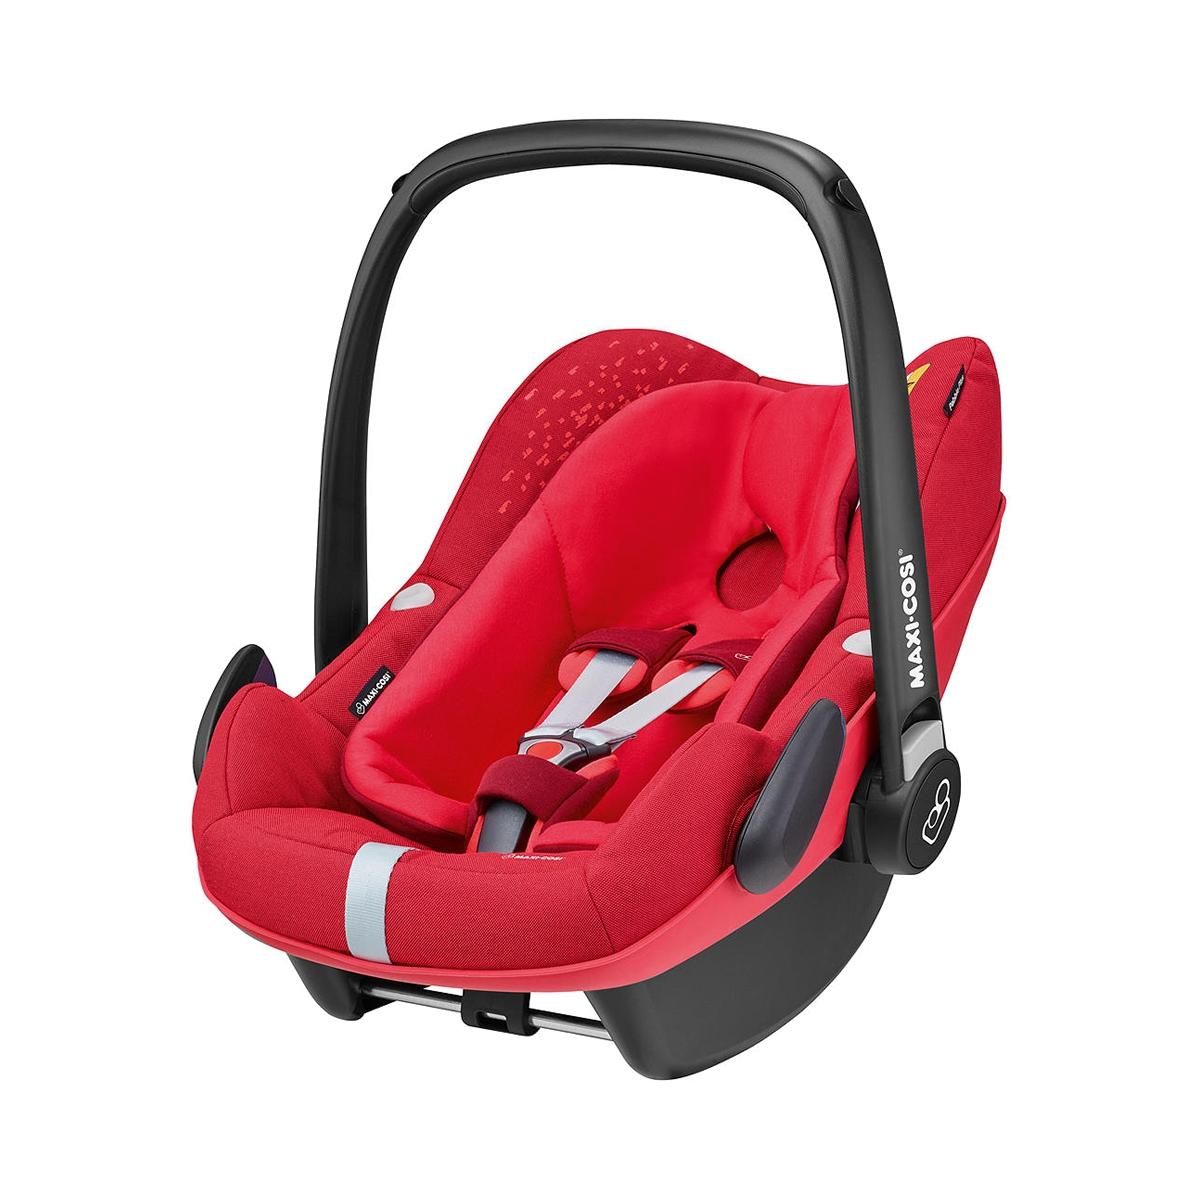 Maxi Cosi Pebble Plus Group 0+ Car Seat-Vivid Red (NEW 2019)